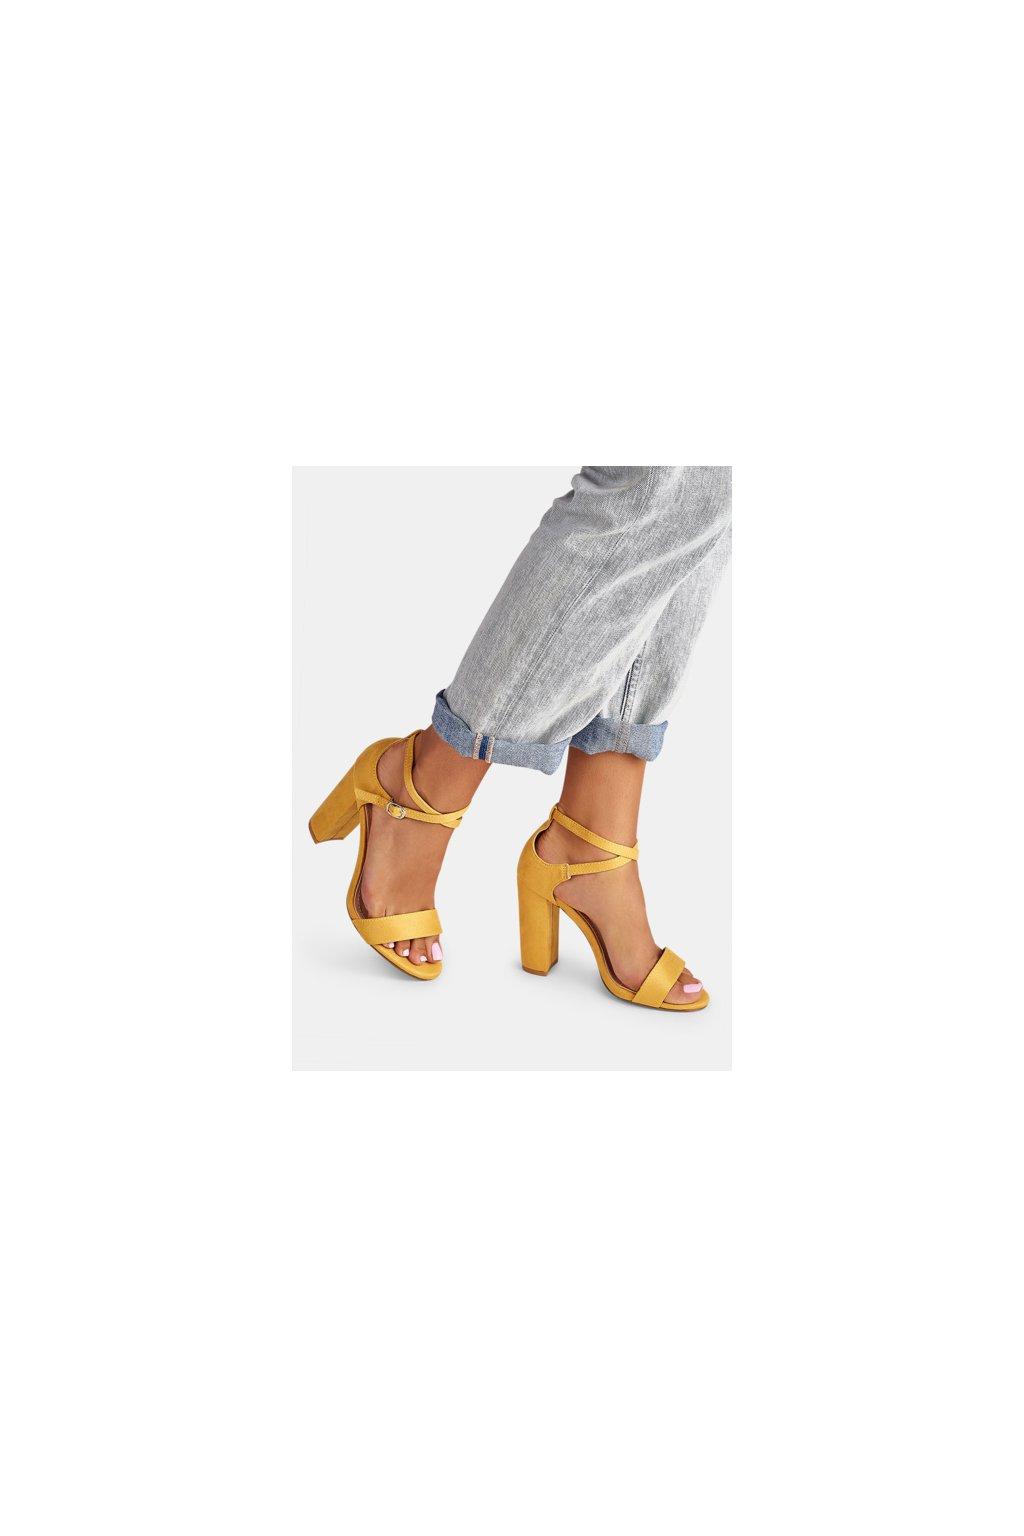 33f0f83498 opatrný anglicky · Žleté sandále na opätku Courie kam vyrazit o víkendu v  ostravě